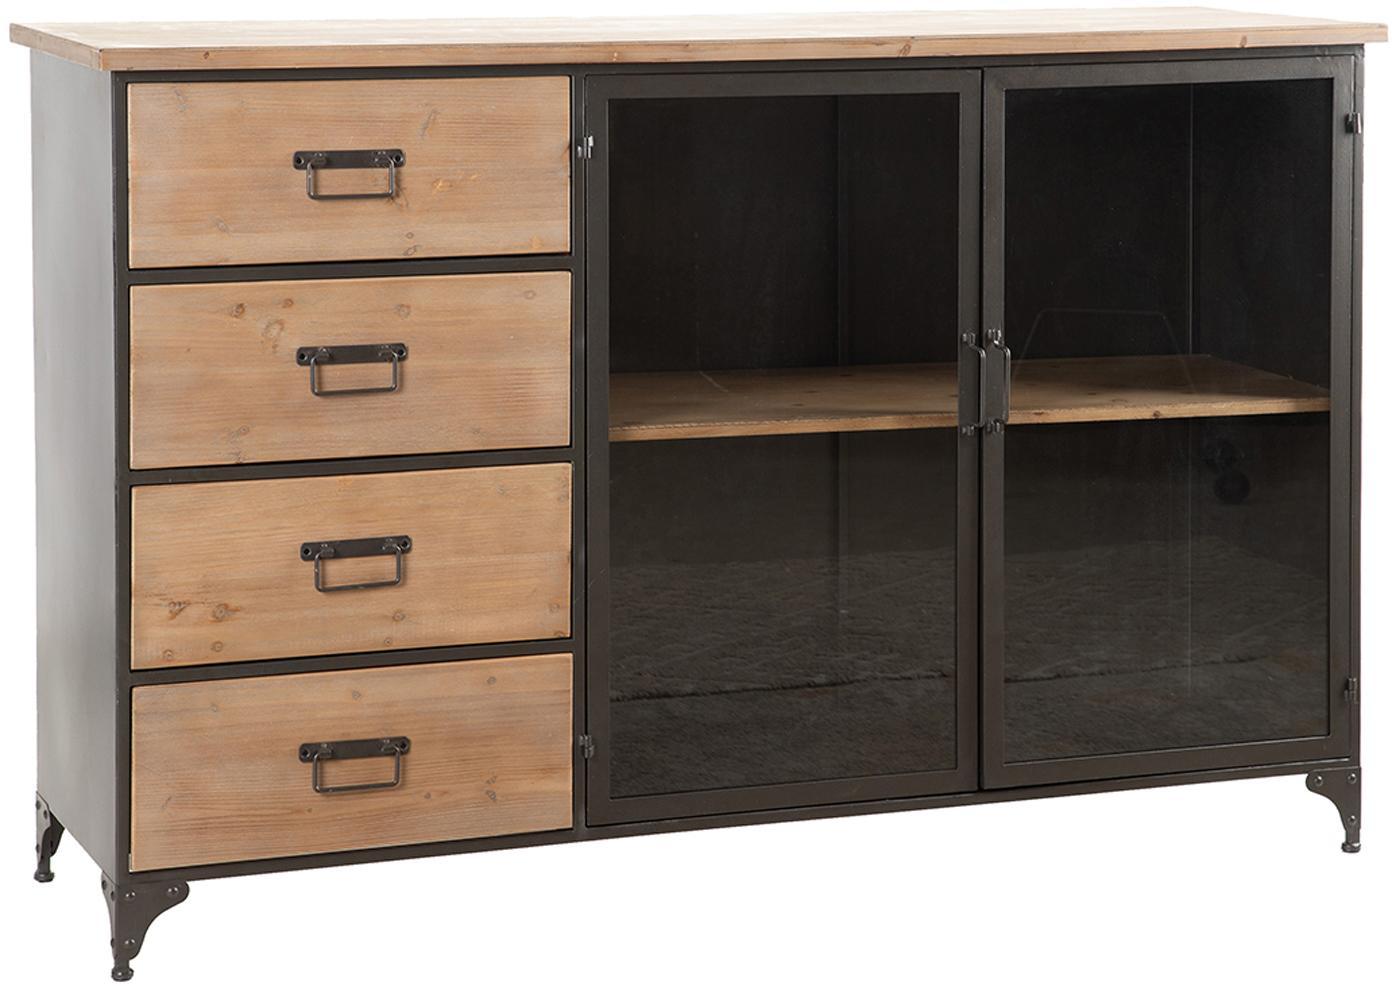 Aparador de madera de abeto Elsa, Estructura: metal, Marrón, negro, An 143 x Al 91 cm